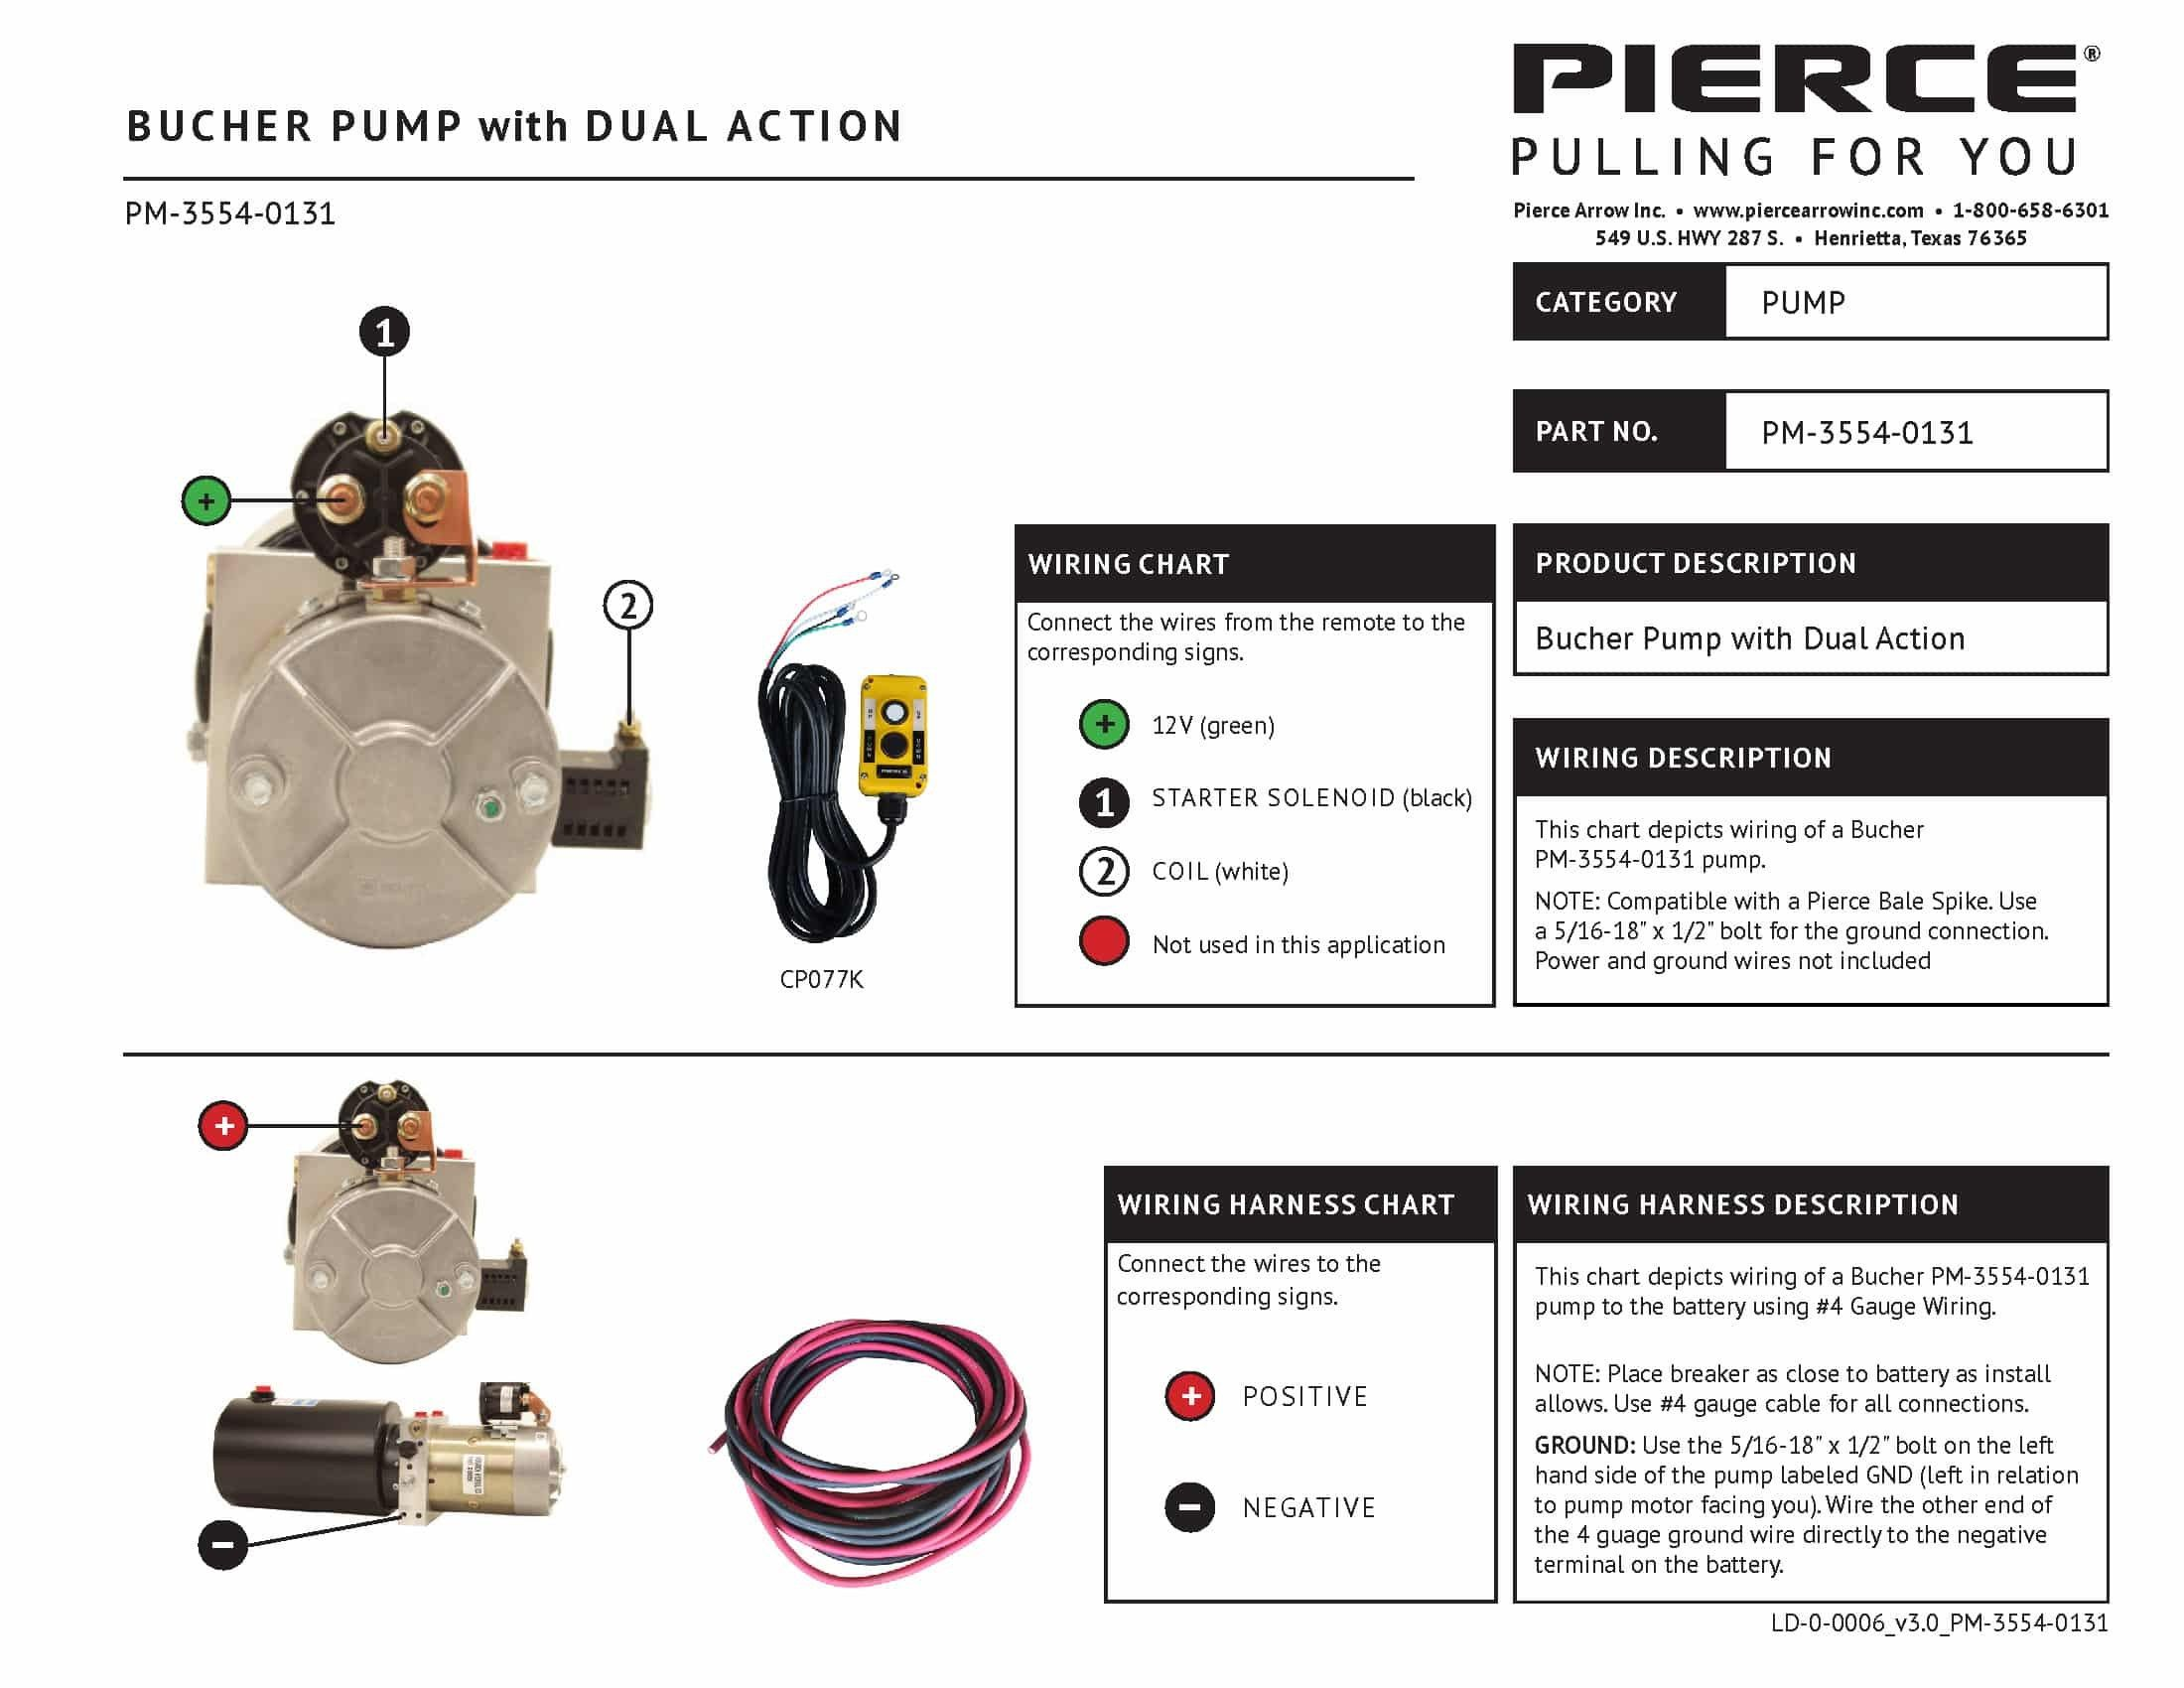 How To Wire A Traveller Wireless Remote Wireless Remote Wire